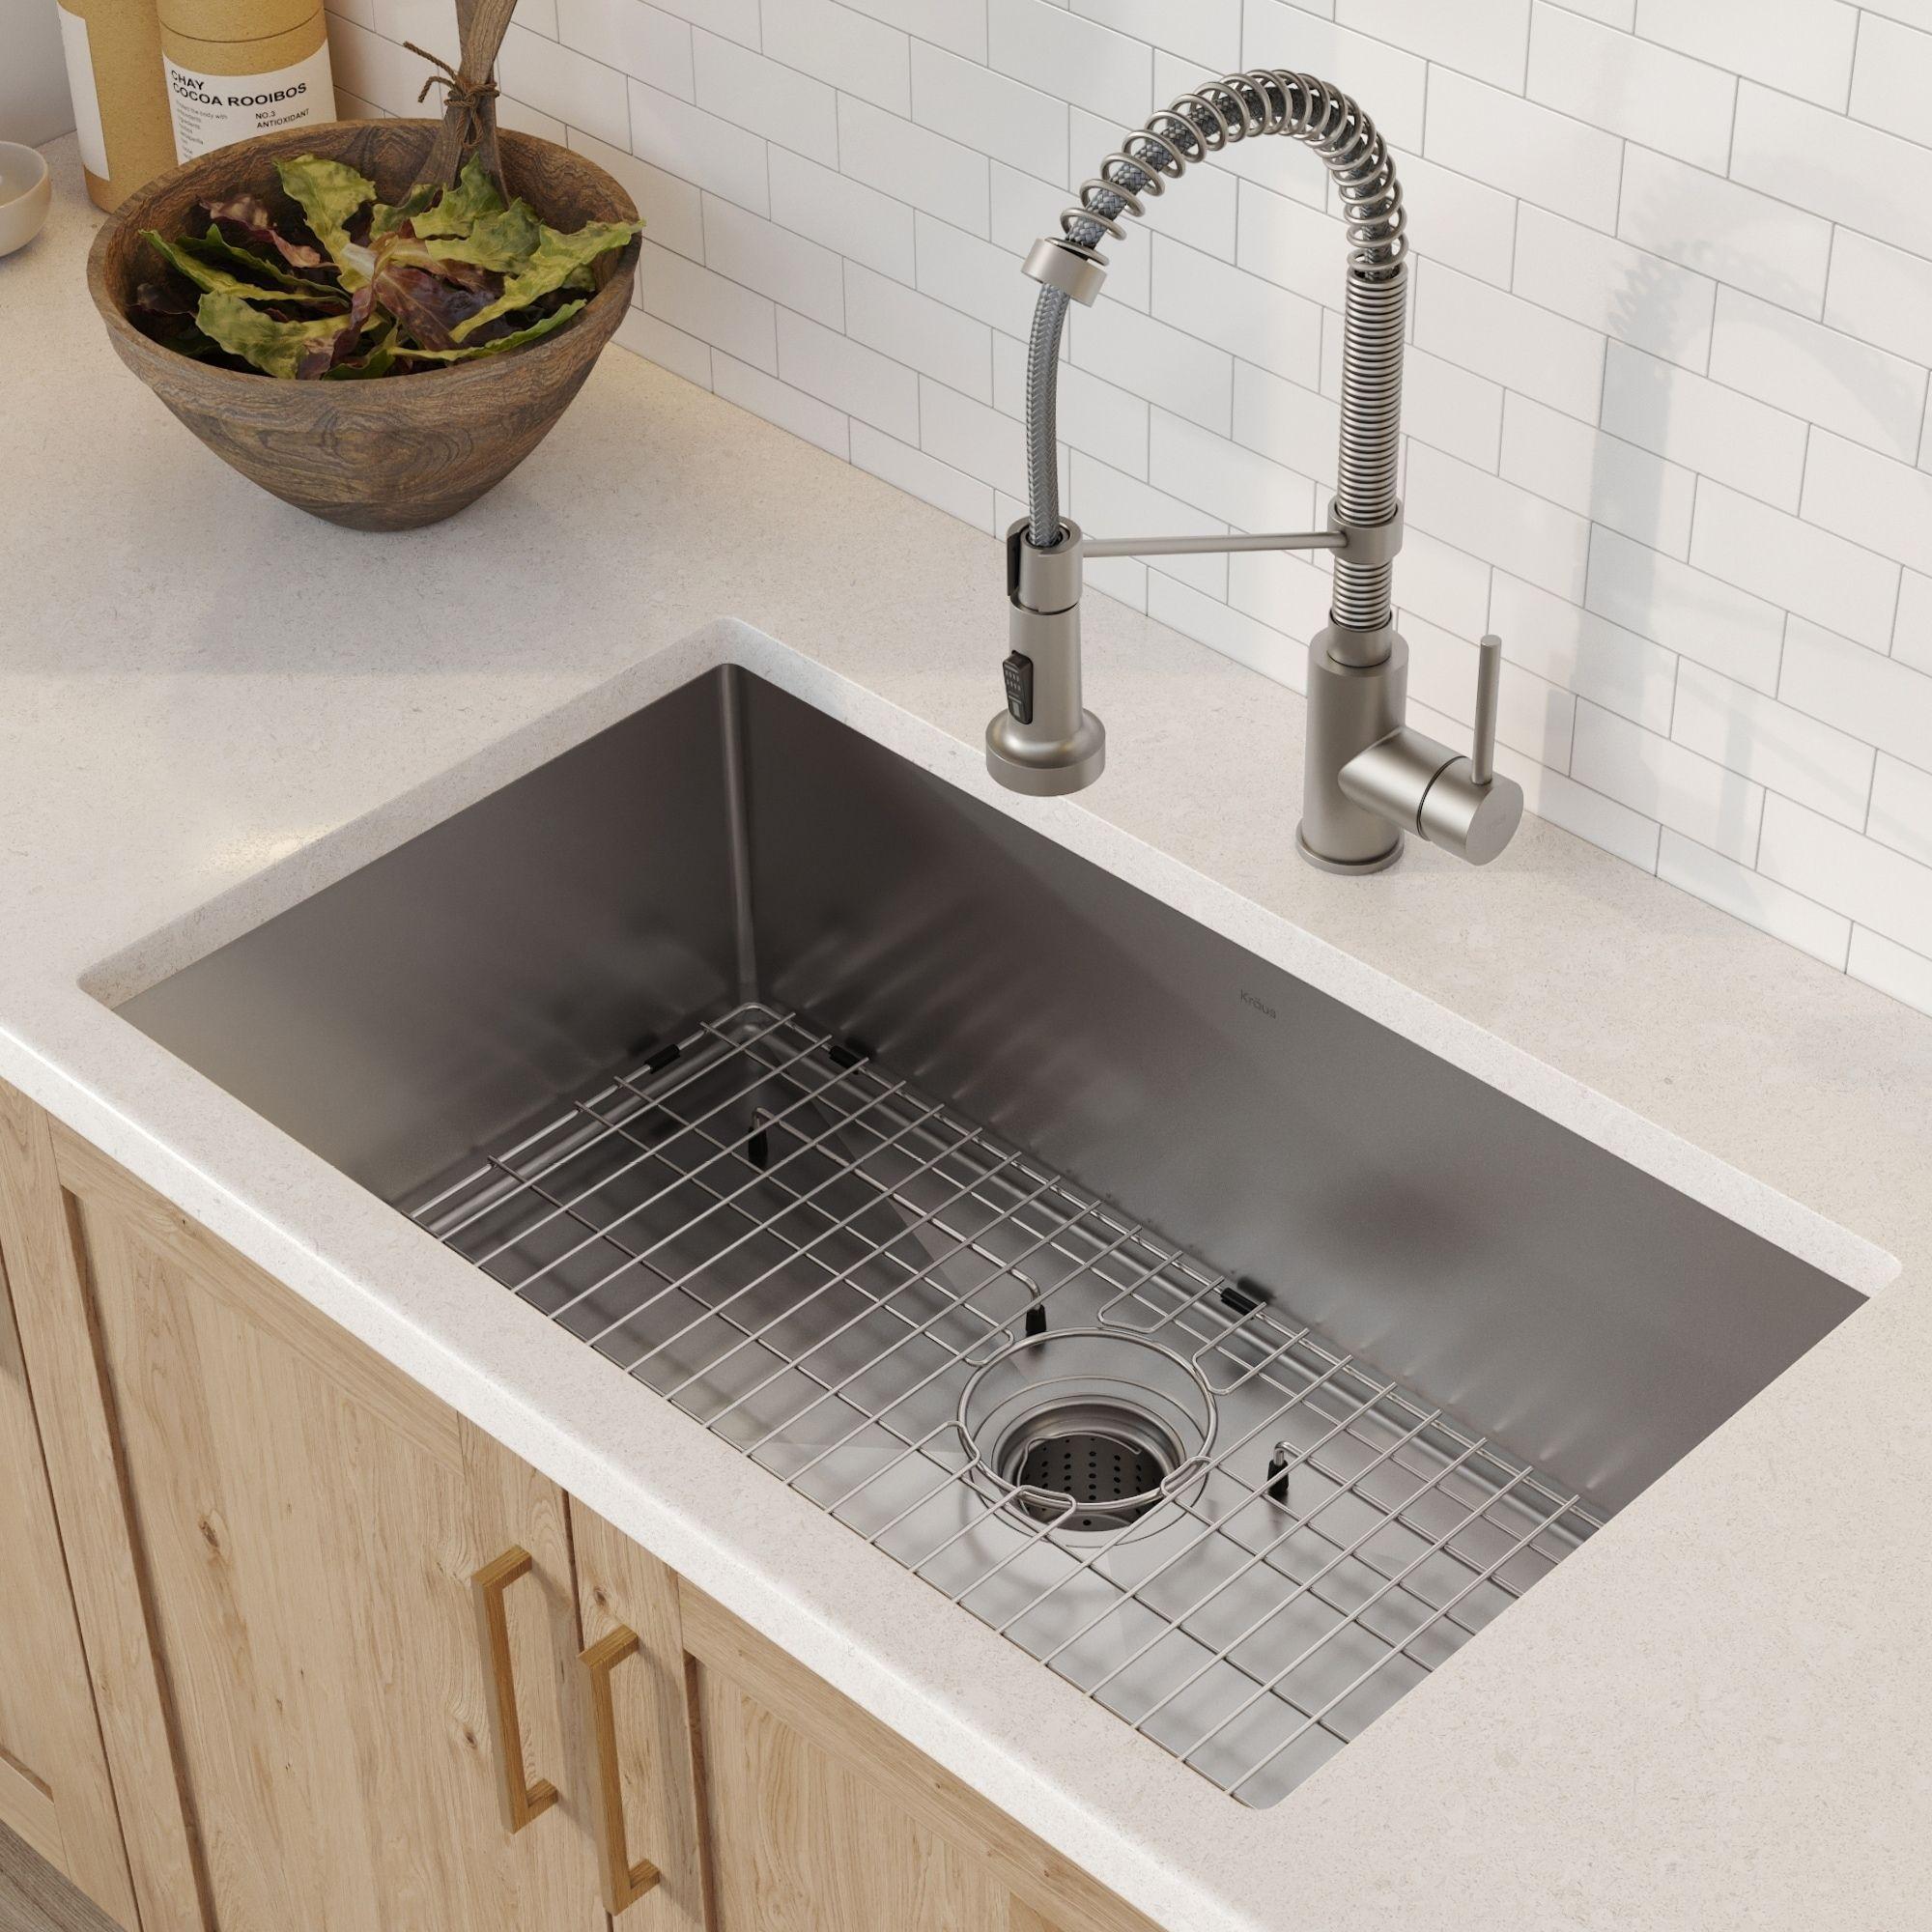 Kraus 32 Inch Stainless Steel Kitchen Sink Faucet Soap Dispenser